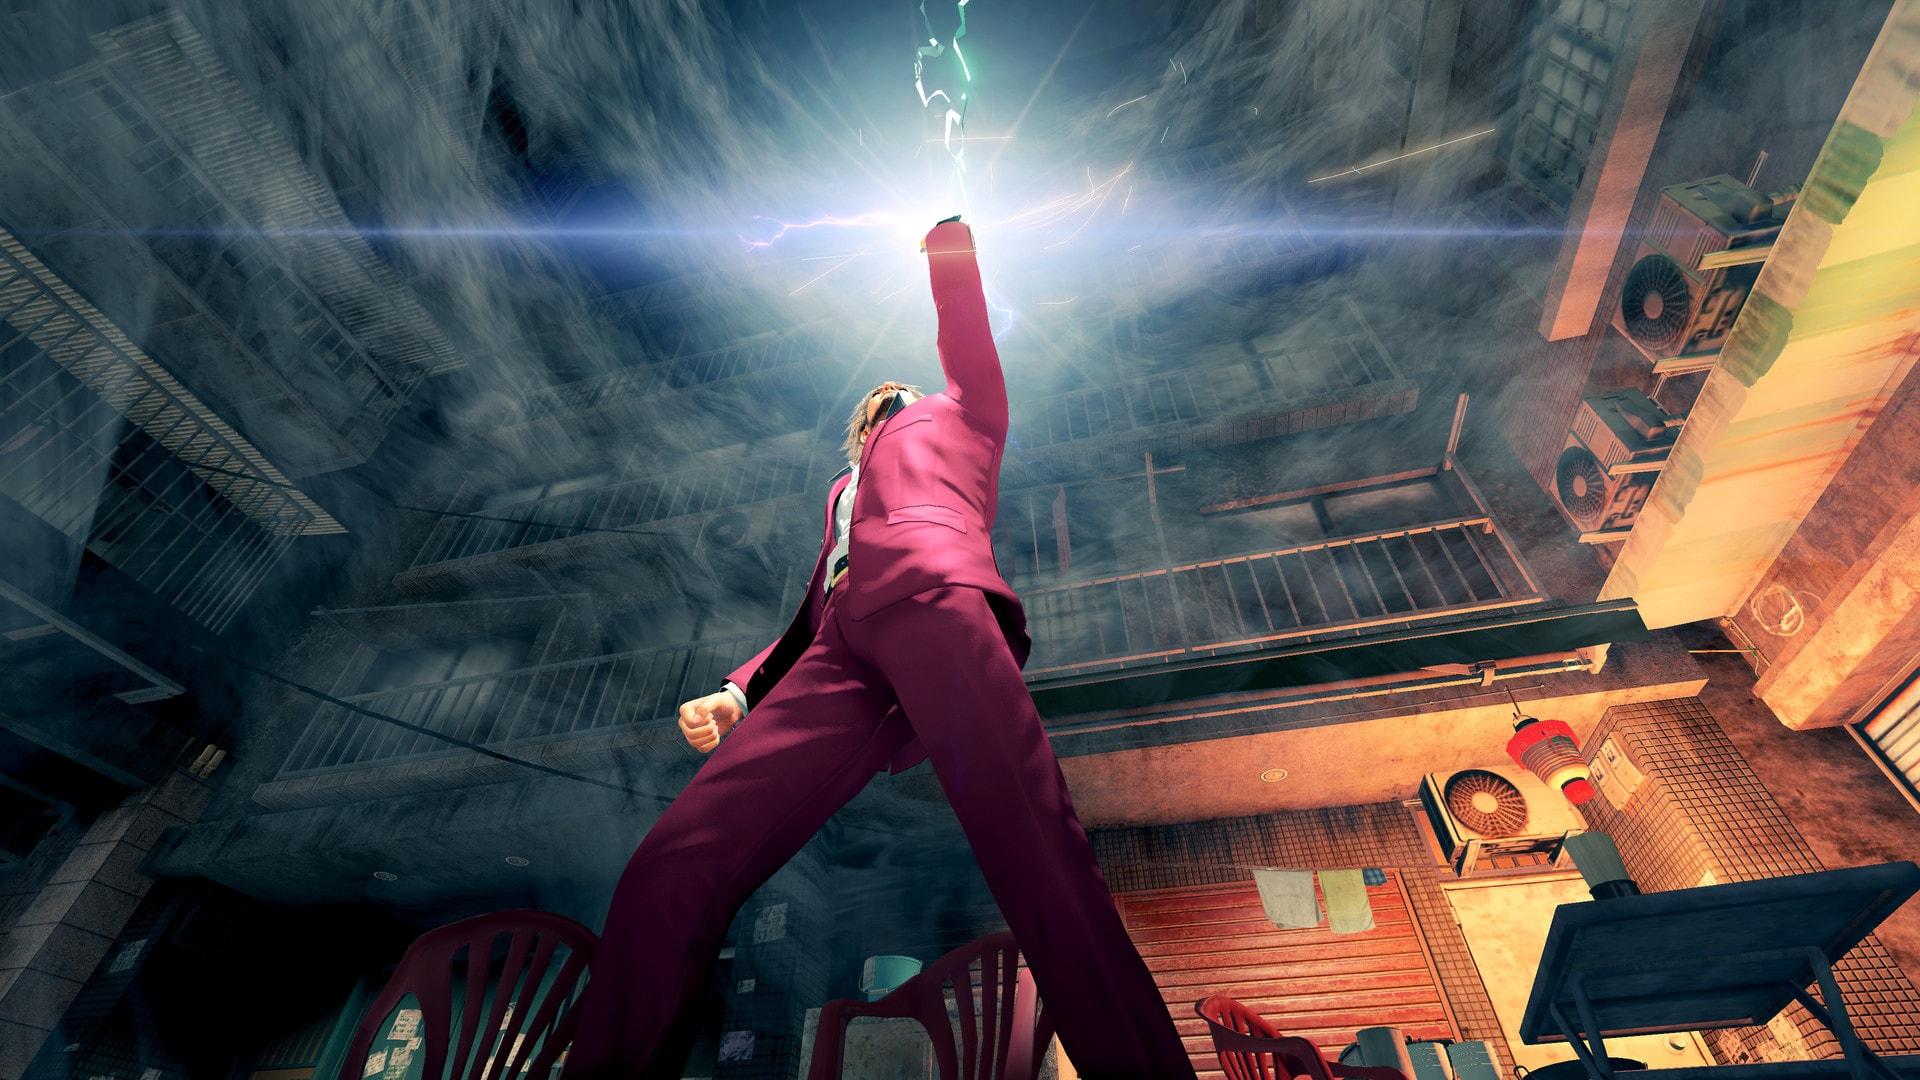 Yakuza: Like a Dragon | Day Ichi Edition (Xbox One, Windows 10) - Xbox Live Key - UNITED STATES - 2